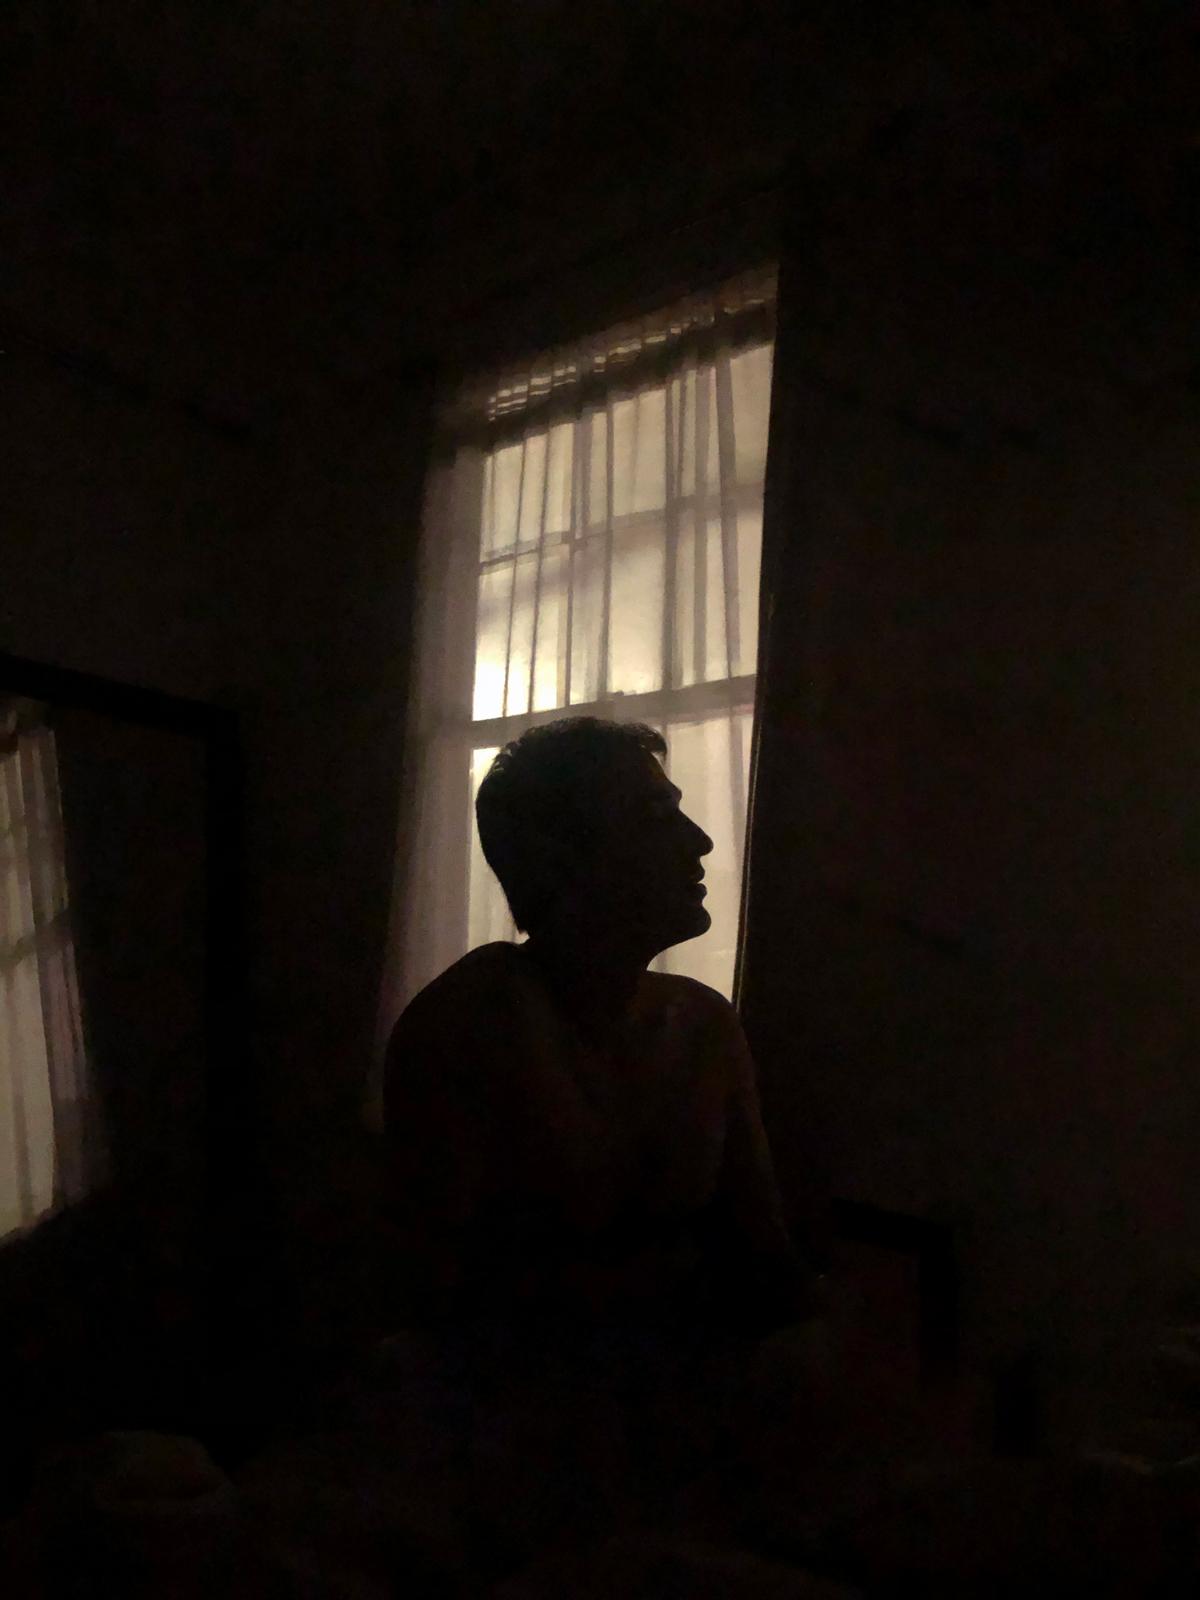 Portrait of man's dimly lit silhouette in front of window